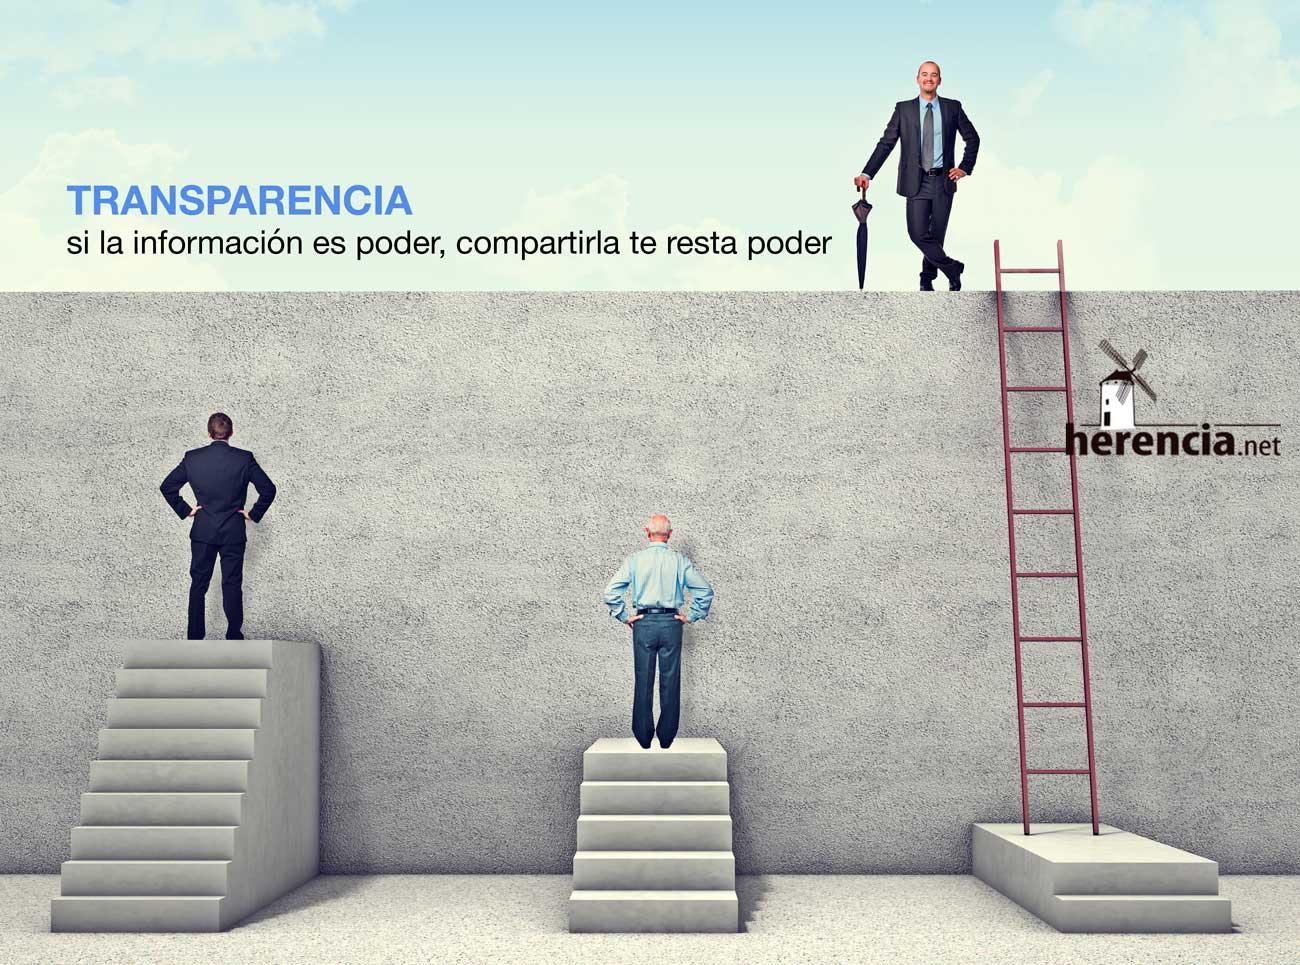 transparencia informacion poder - Transparencia: si la información es poder, compartirla te resta poder